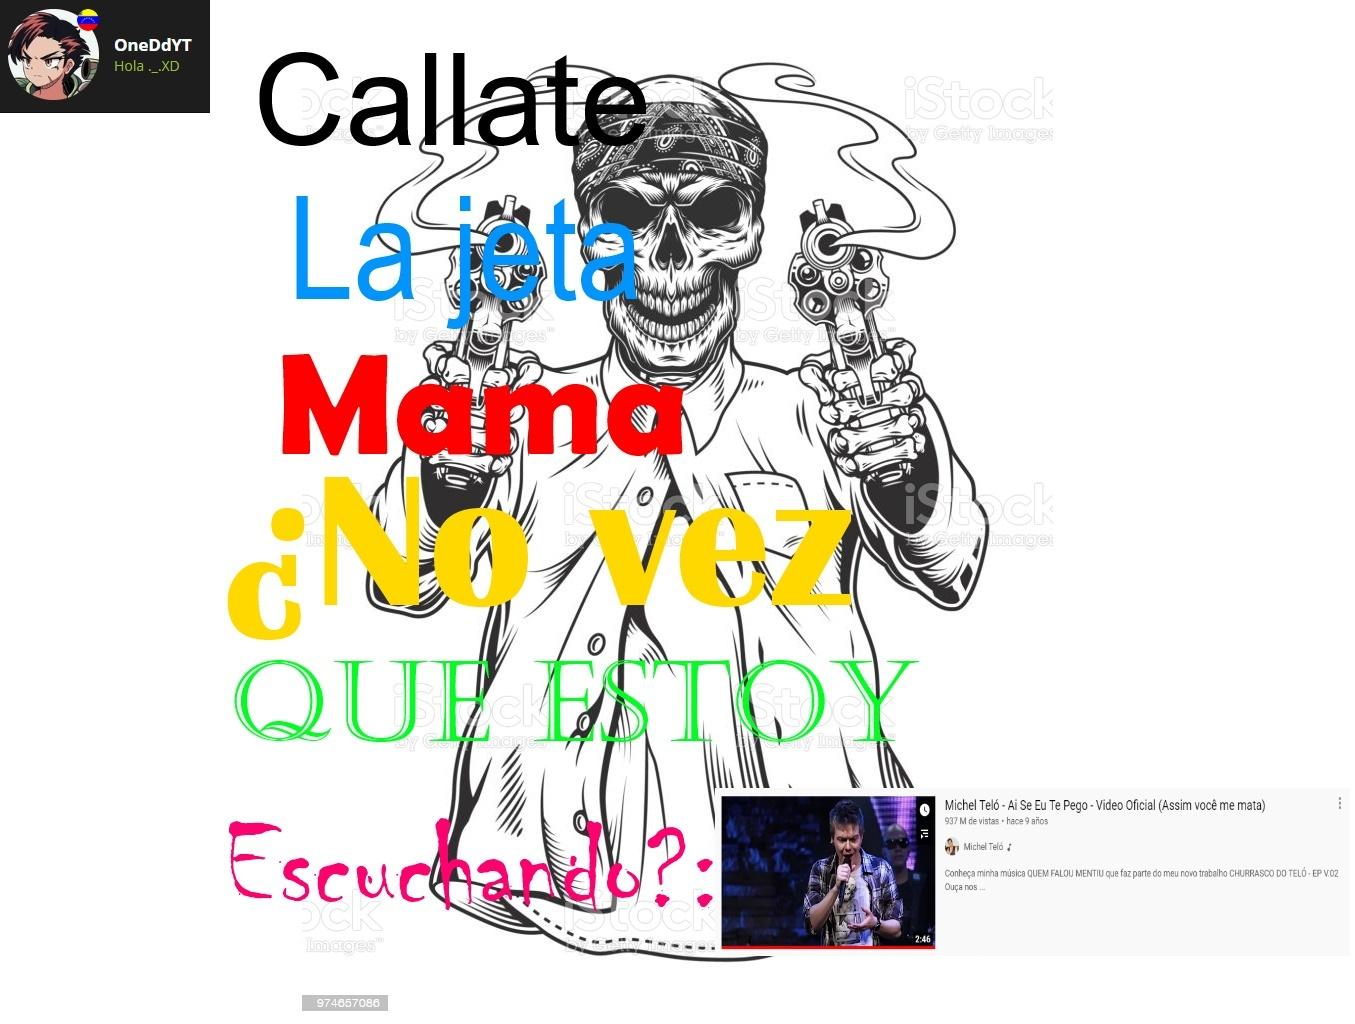 ¡¡¡CALLATE LA JETA!!! By: OneDdYT - meme